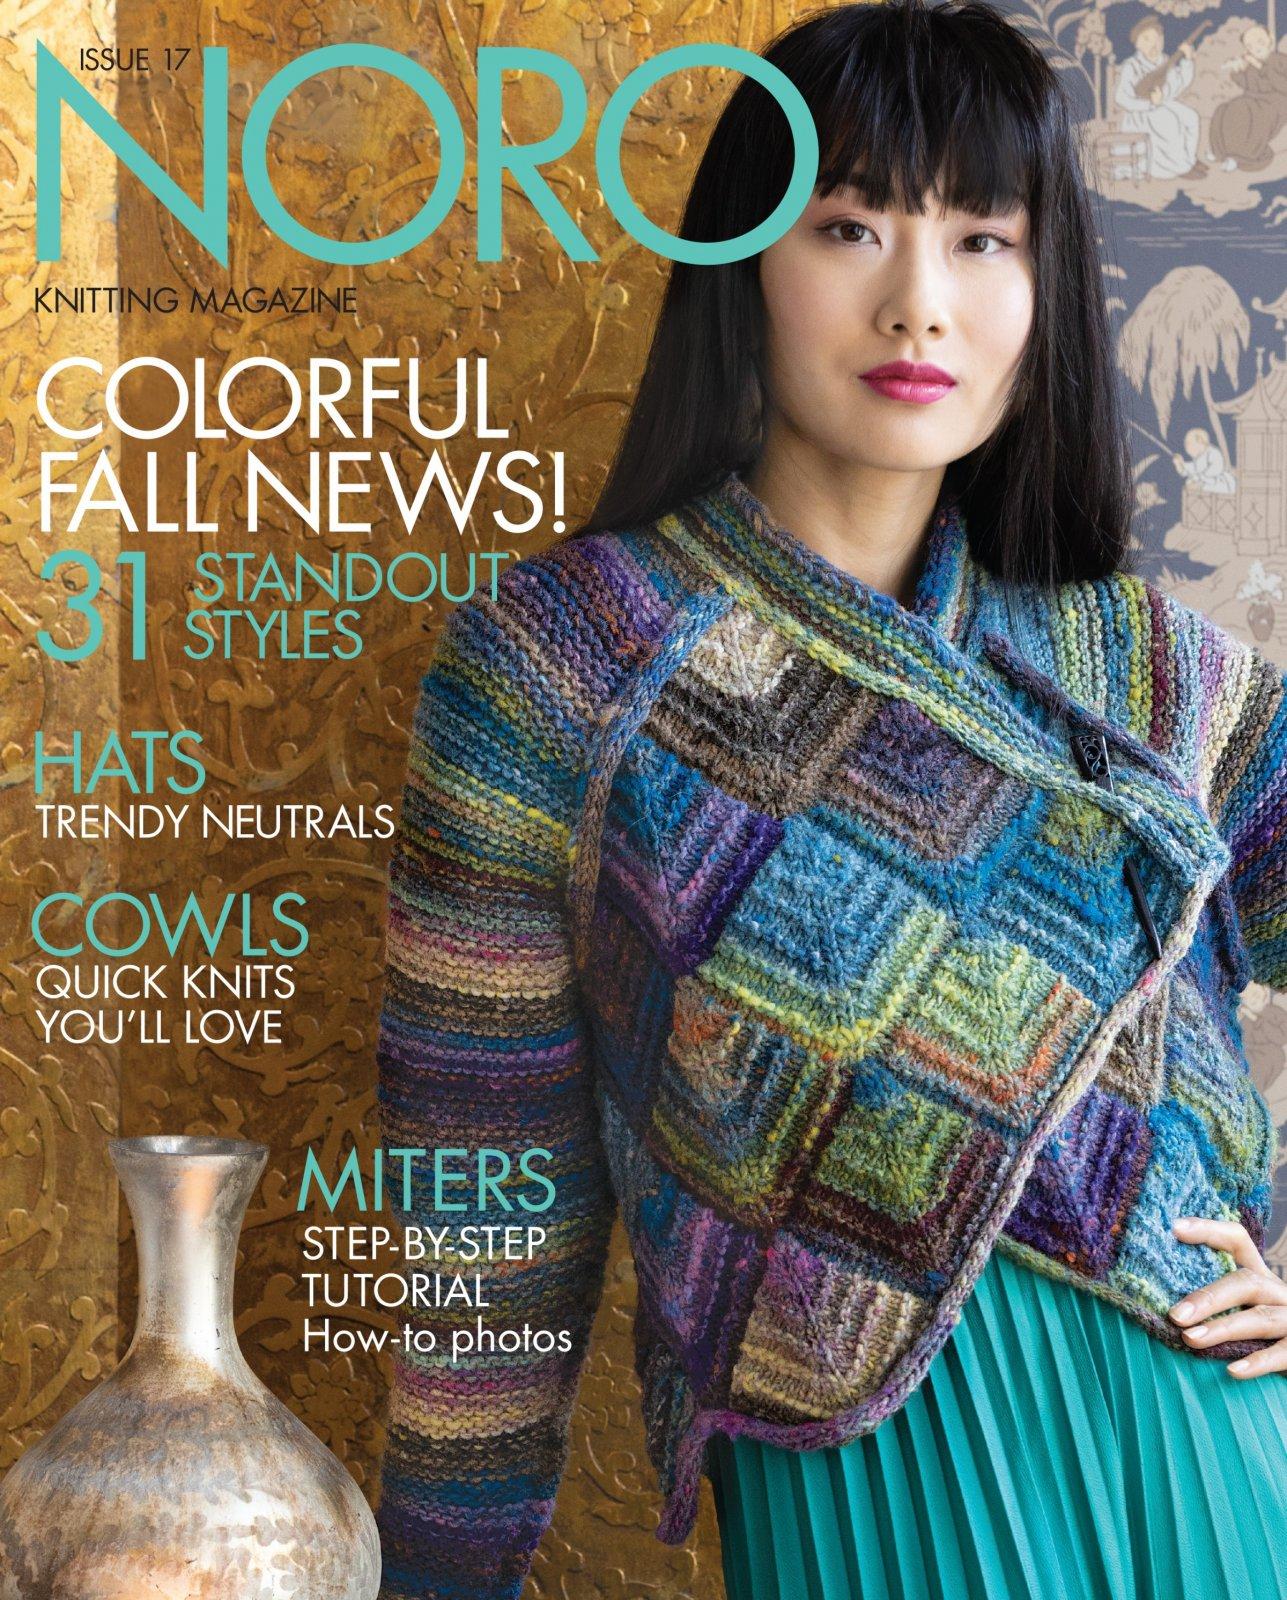 Noro Magazine Issue 17